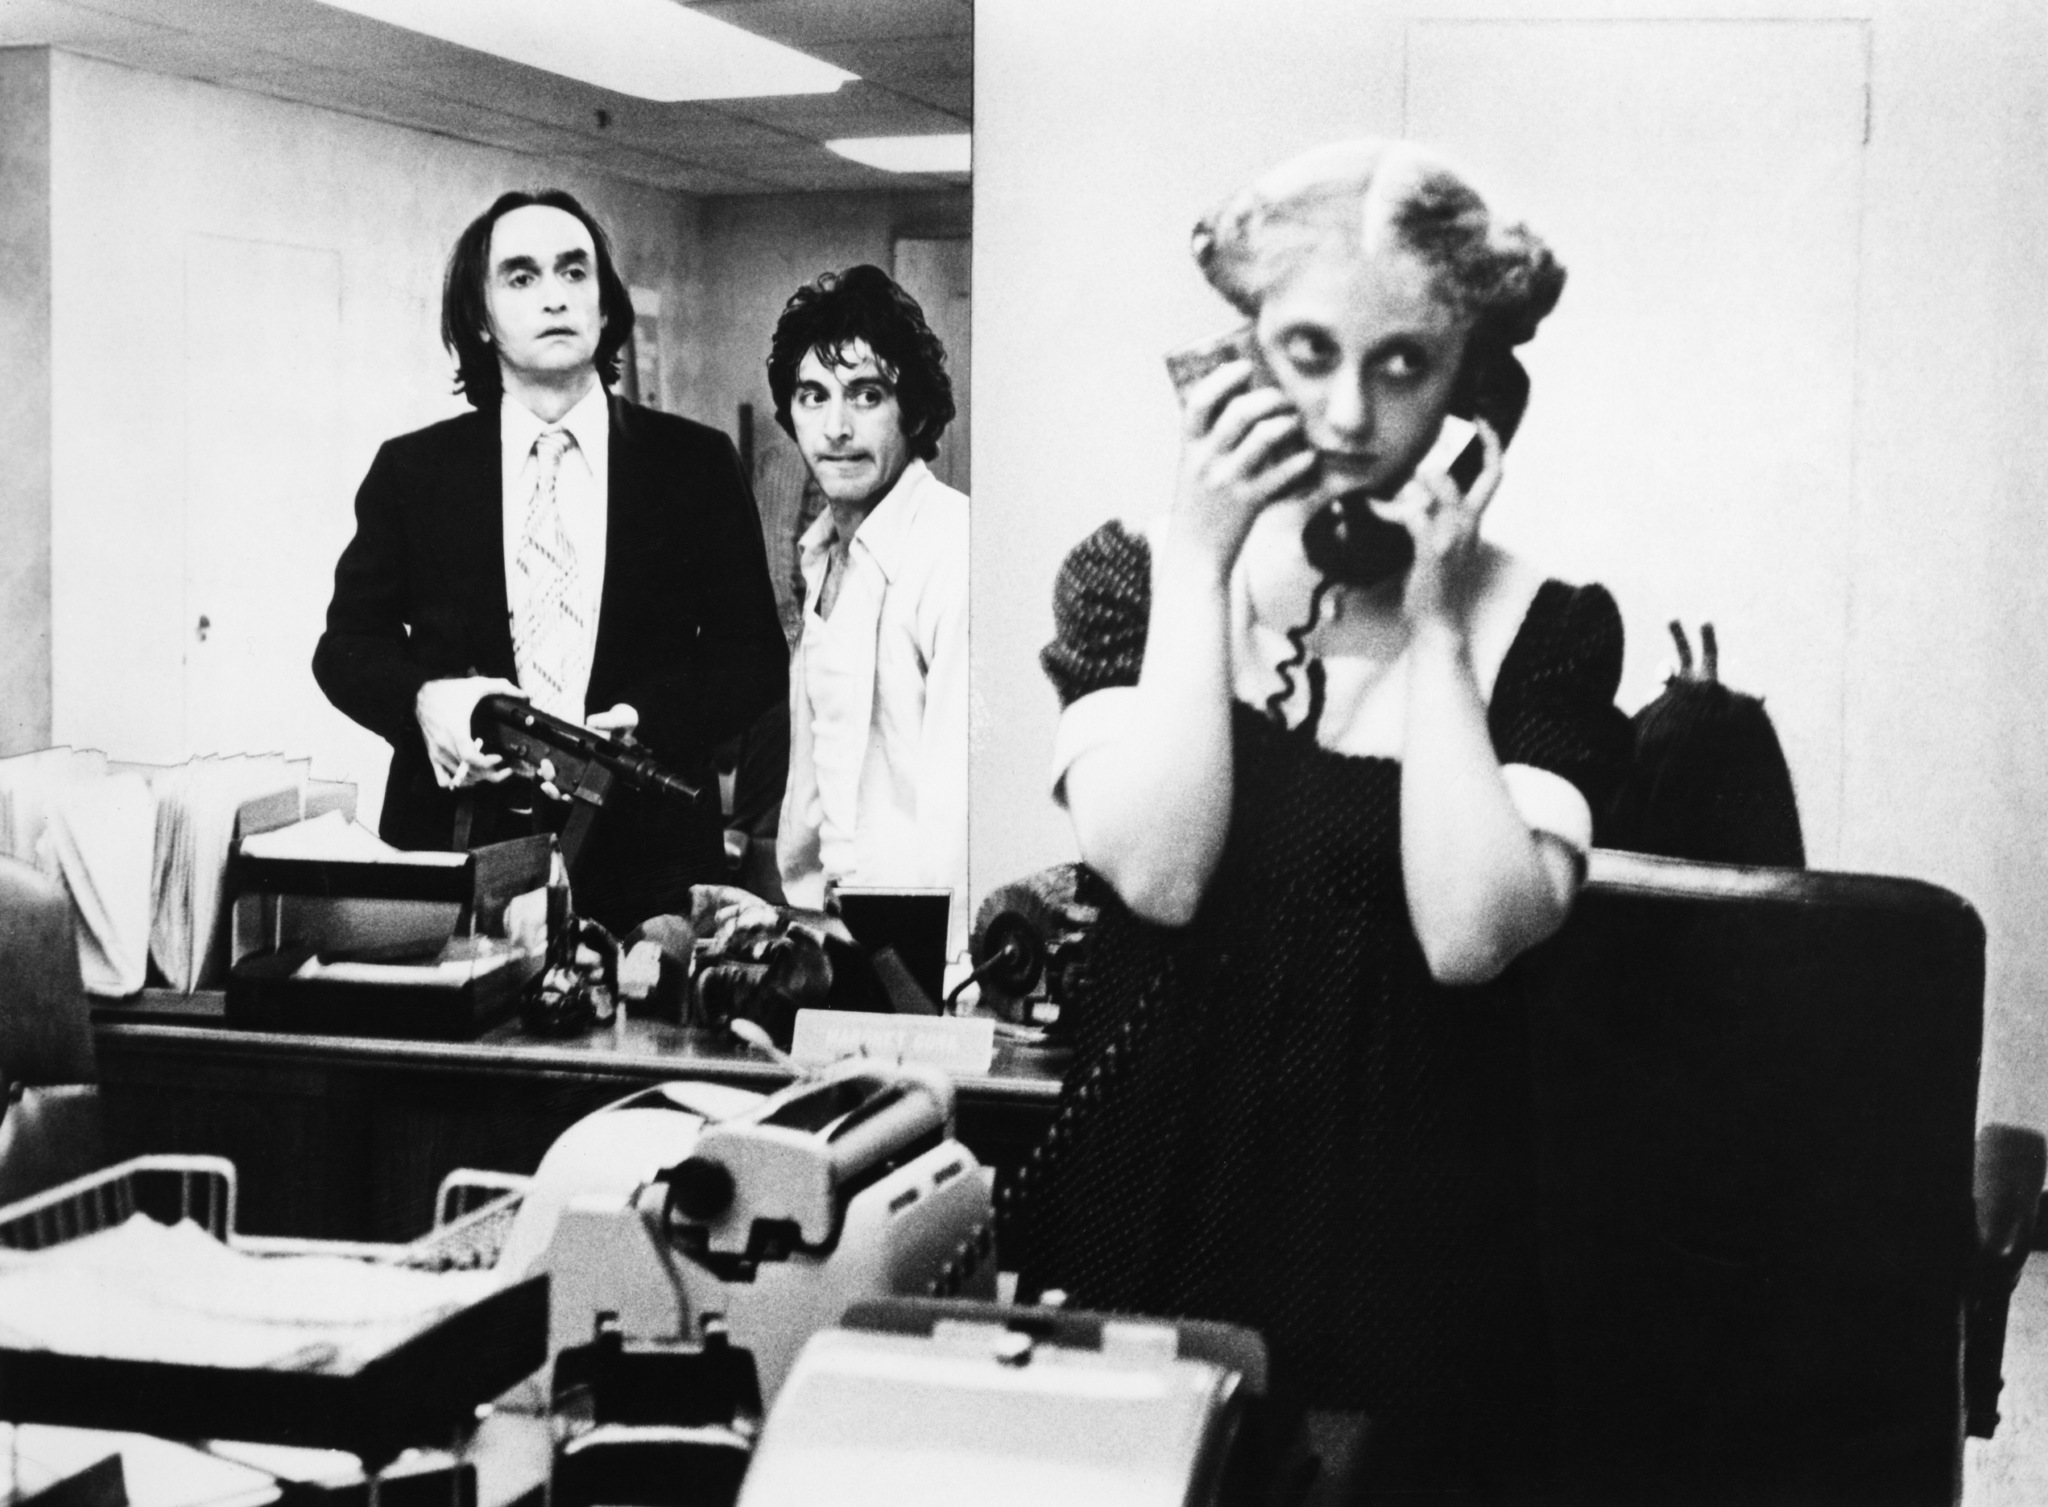 Al Pacino, John Cazale, and Carol Kane in Dog Day Afternoon (1975)